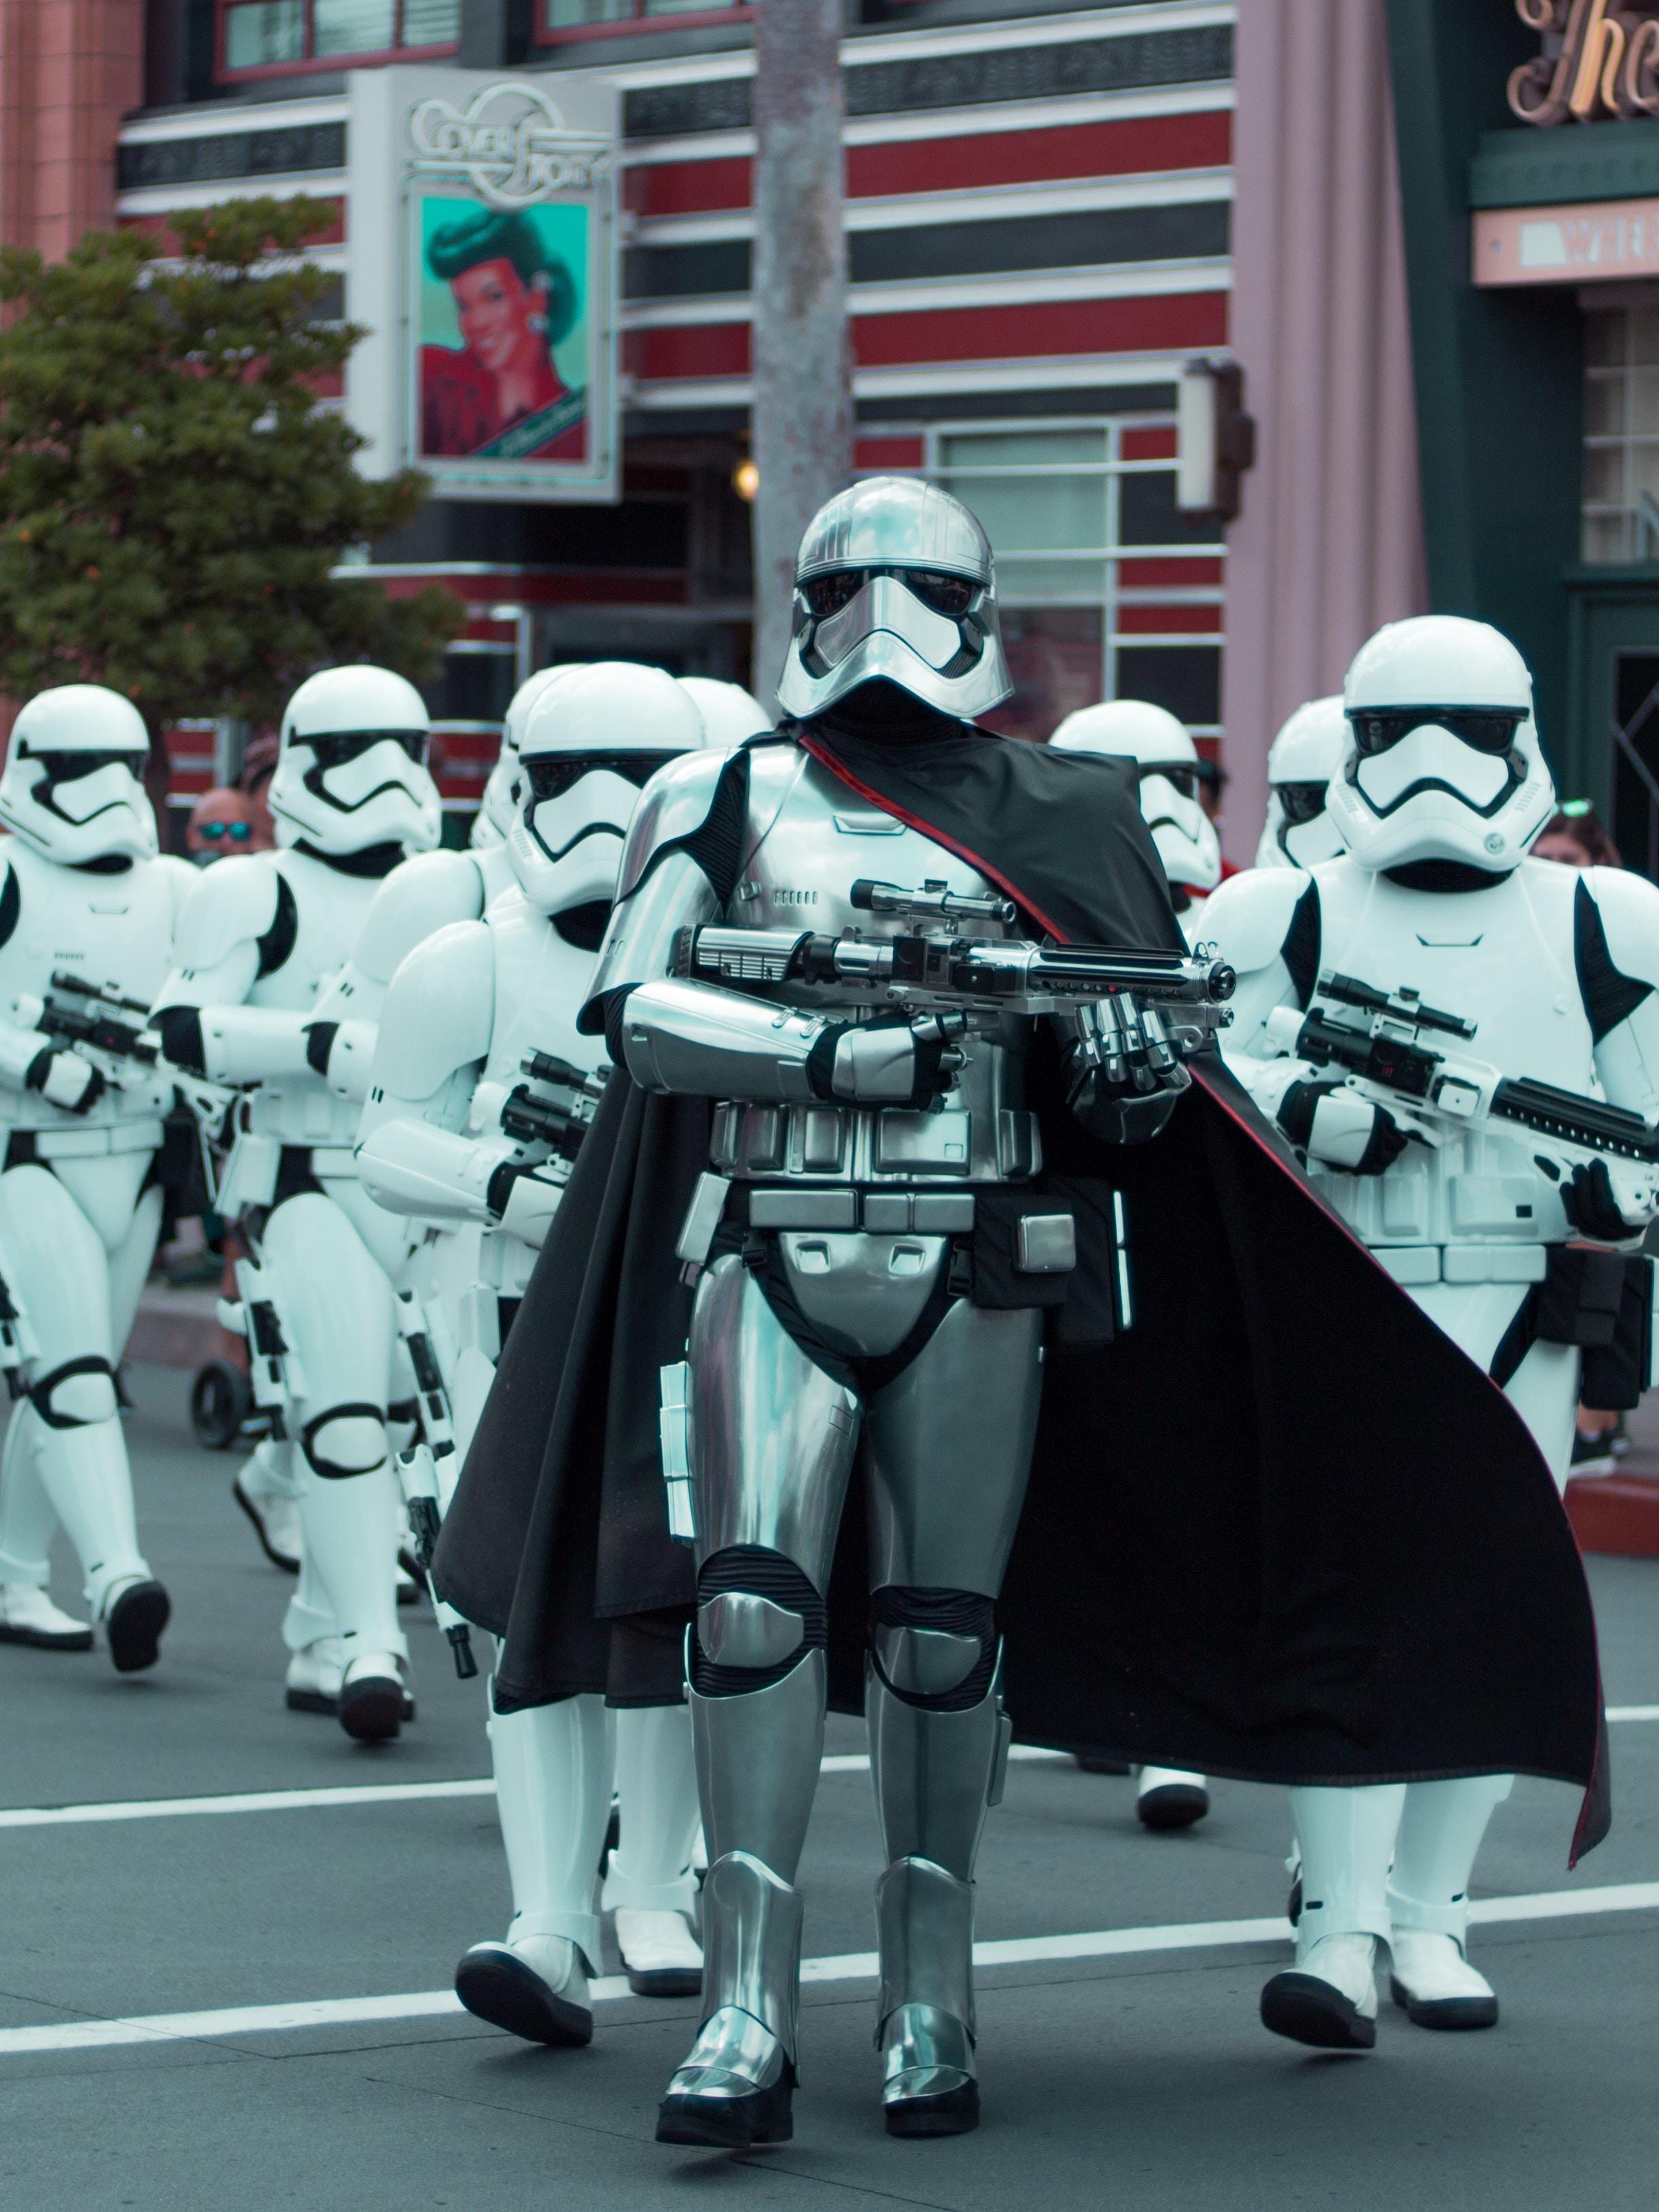 Star Wars Stormtroopers walking at daytime